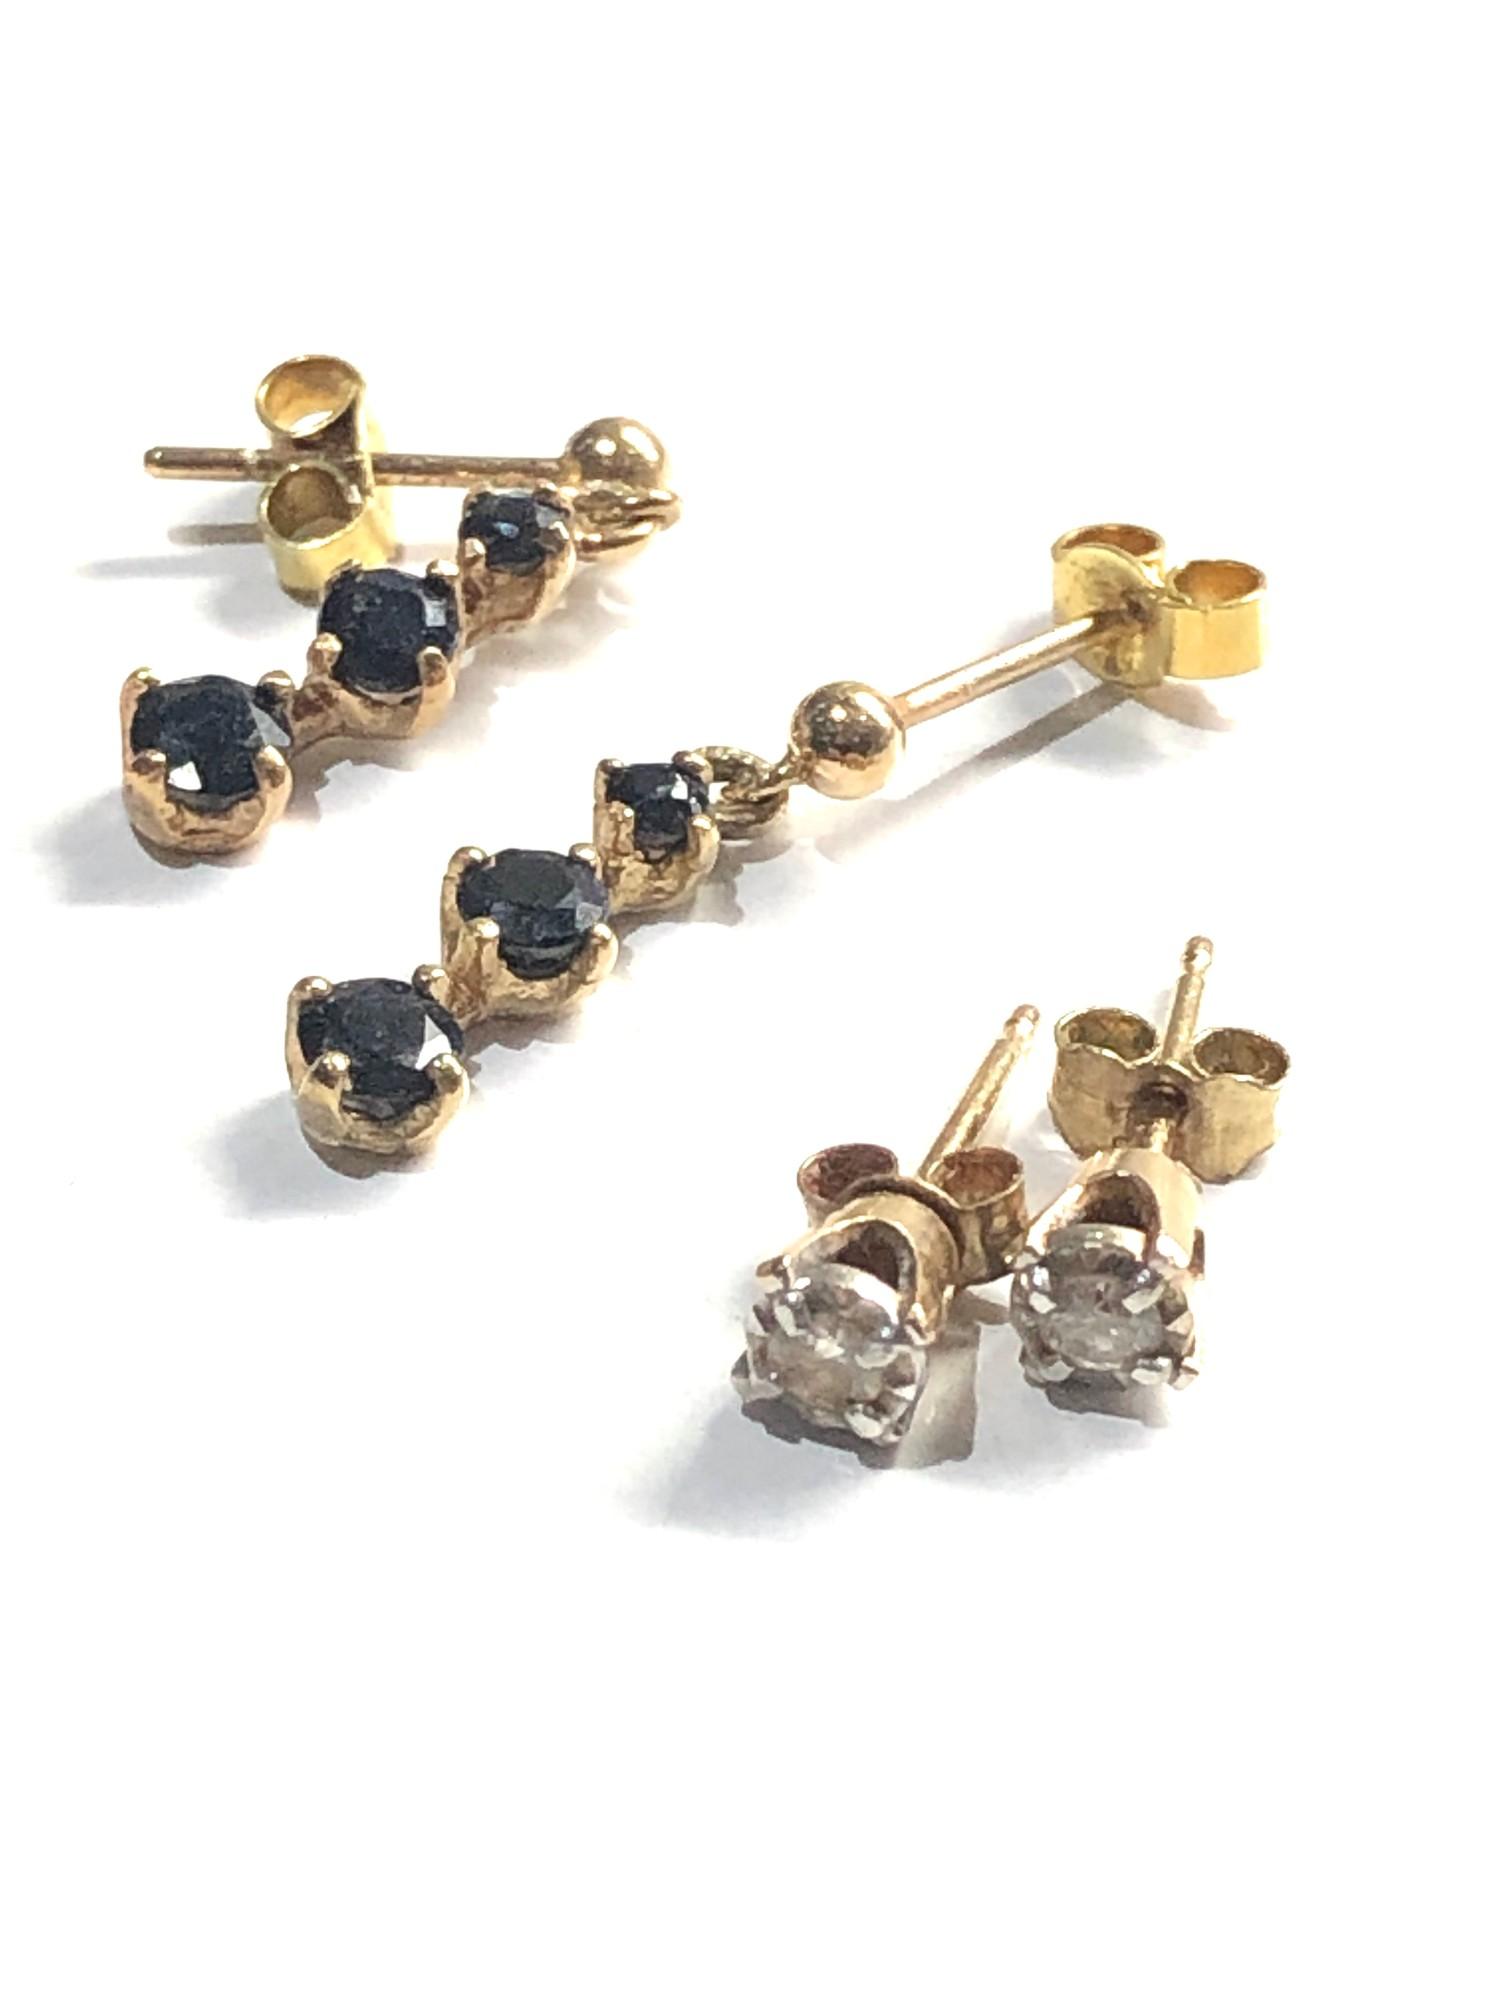 3 x 9ct Gold earrings inc. diamond studs, drops 4.5g - Image 3 of 3